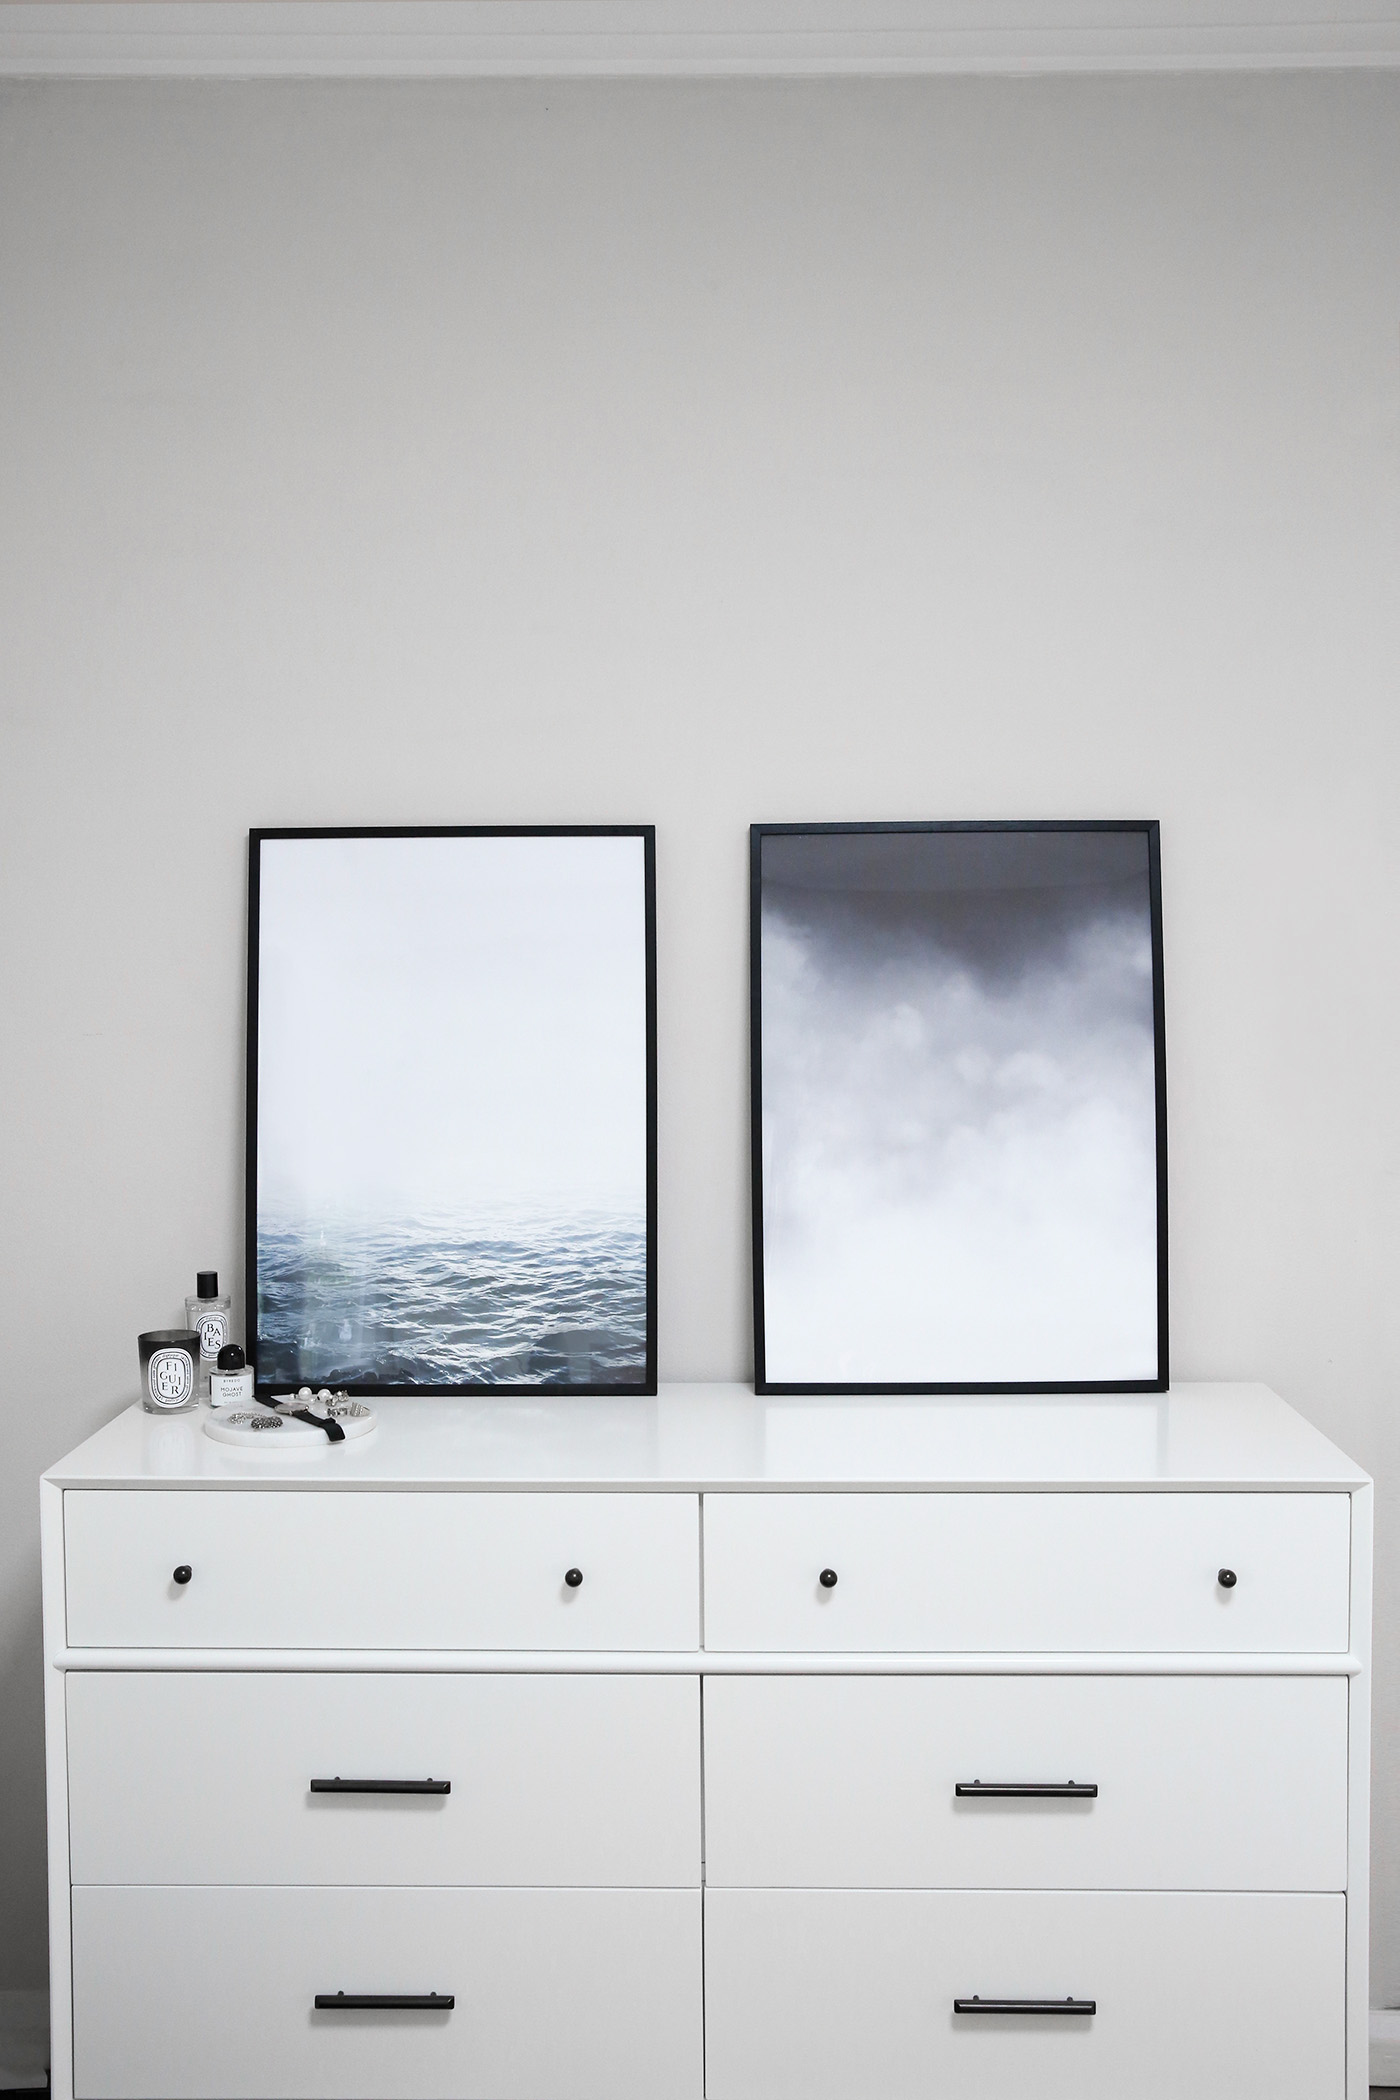 desenio minimal wall art home decor scandinavian